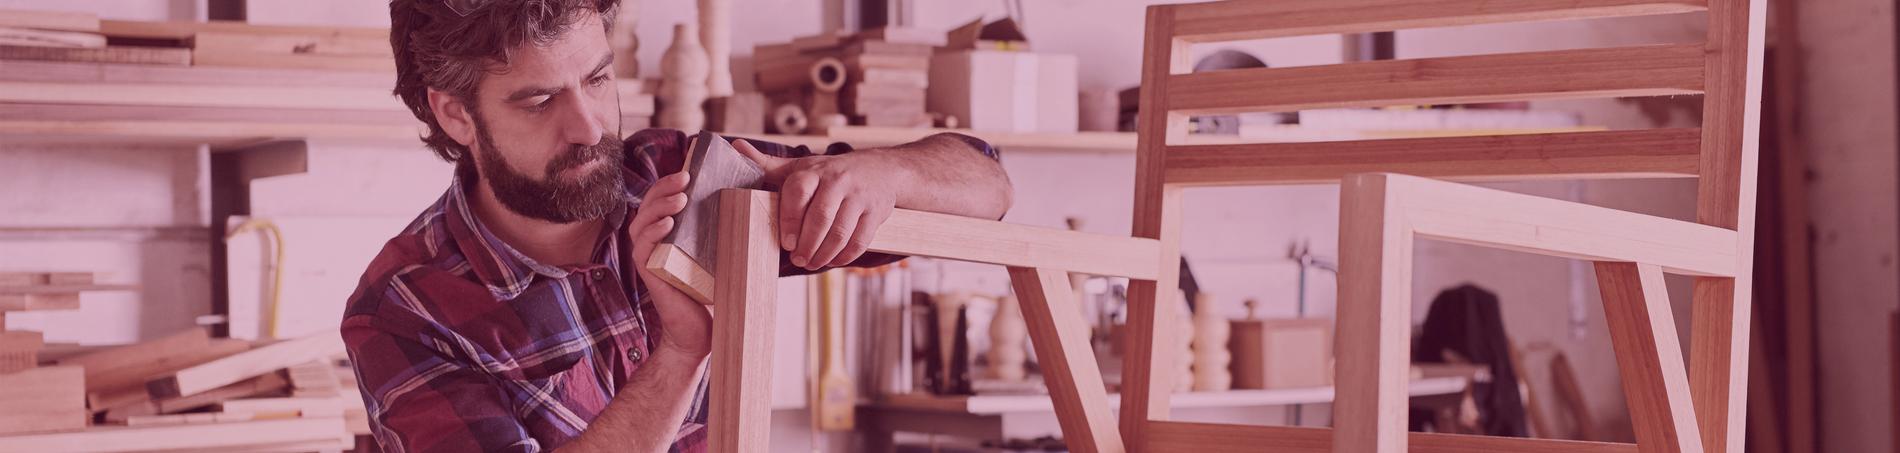 Furniture design course classes run daily during the for Furniture design course